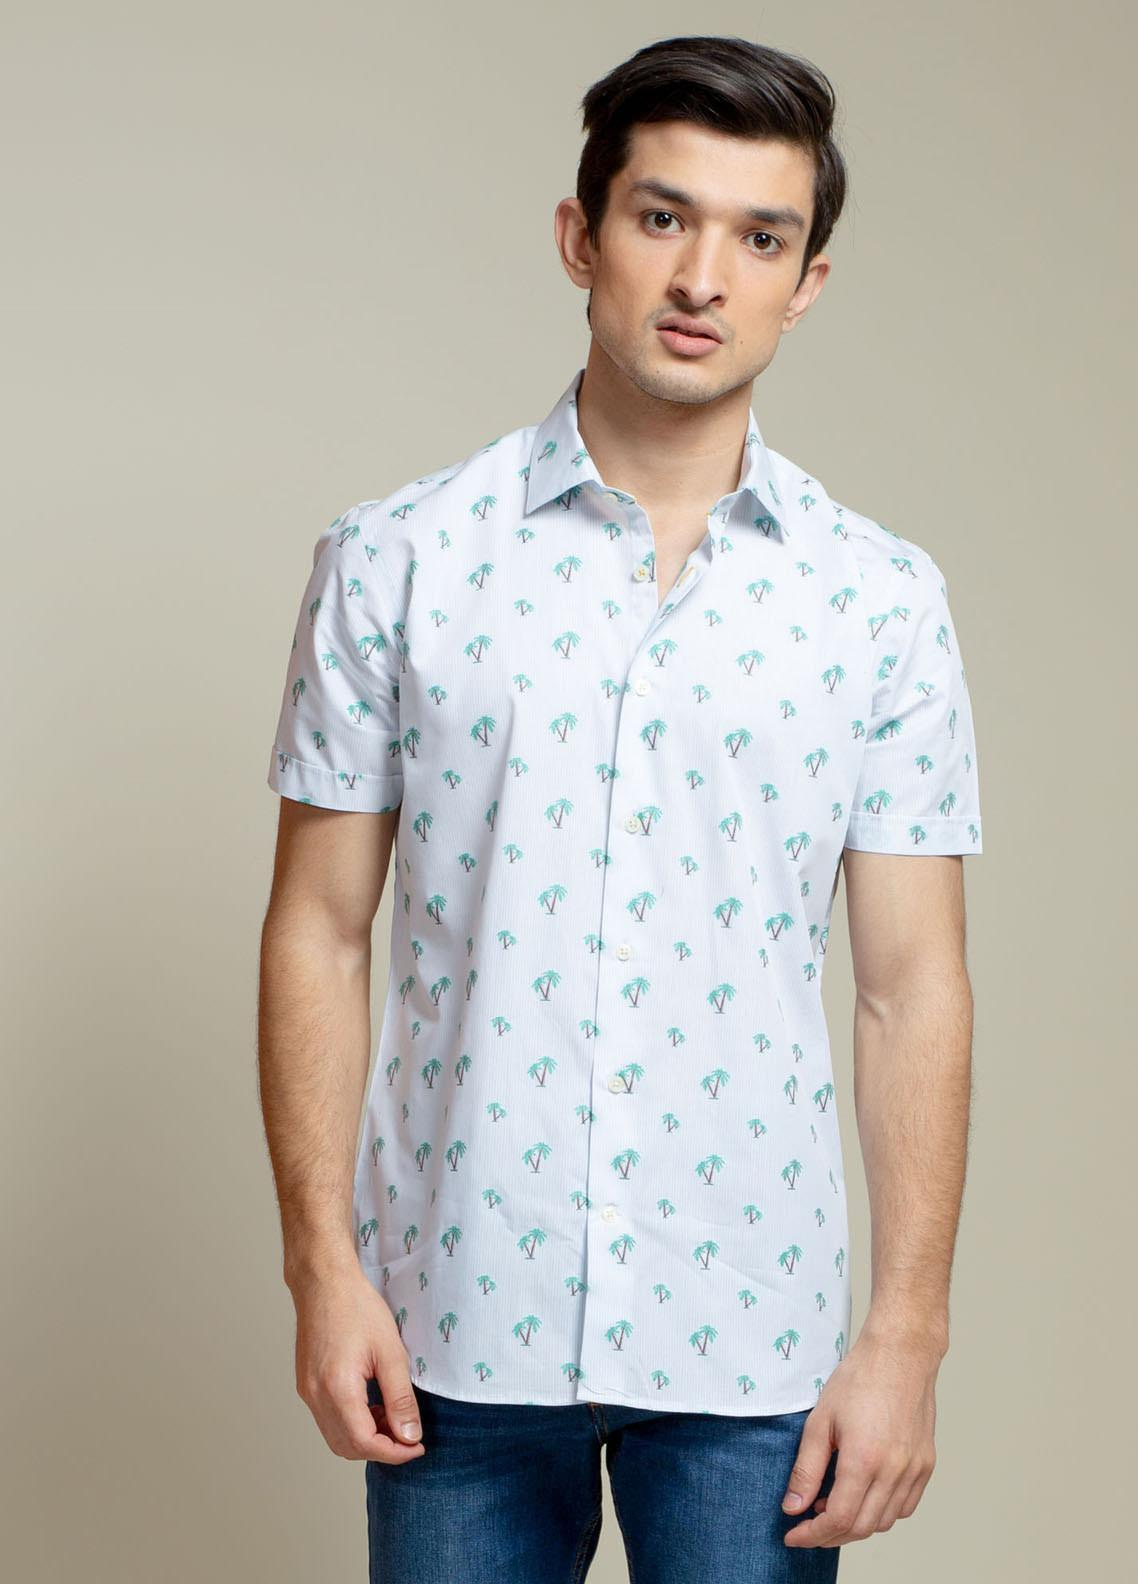 Brumano Cotton Casual Half Sleeves Shirts for Men -  BM21SH Light Blue Tree Patterned